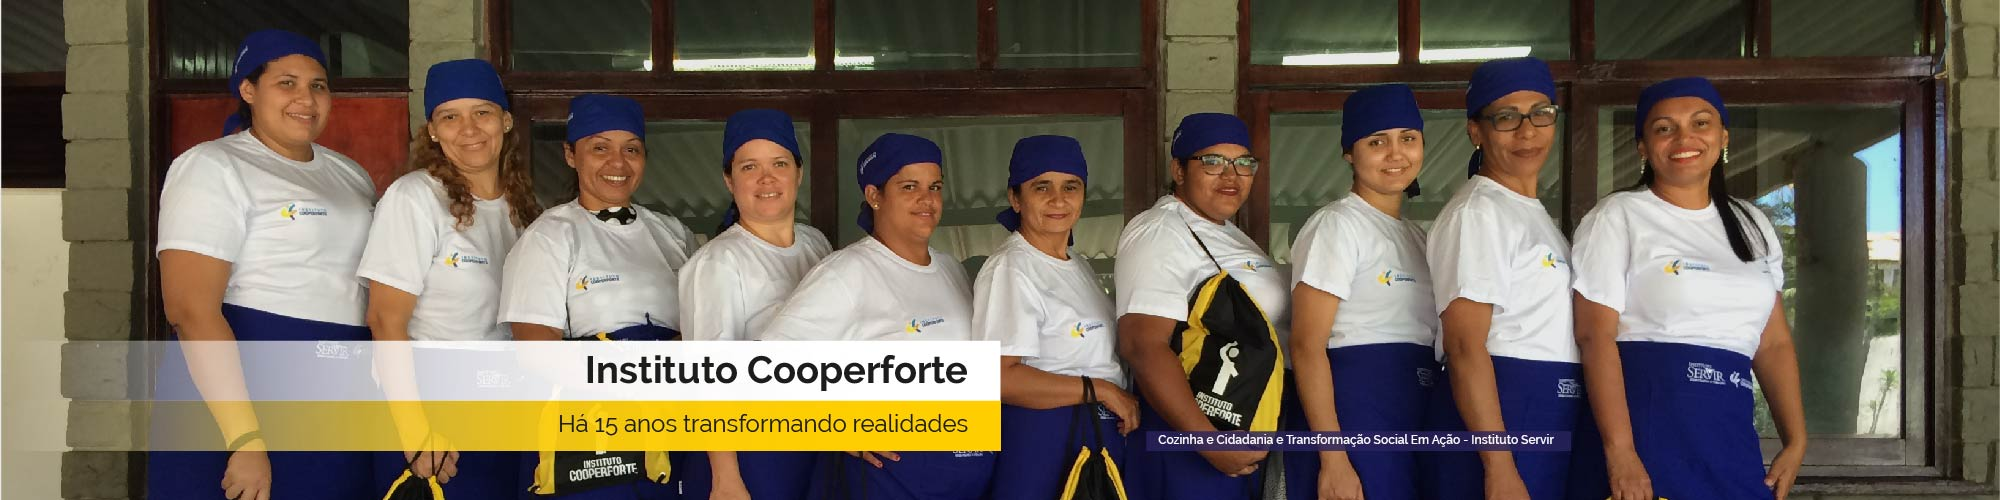 Instituto-Cooperforte---banner-01_03